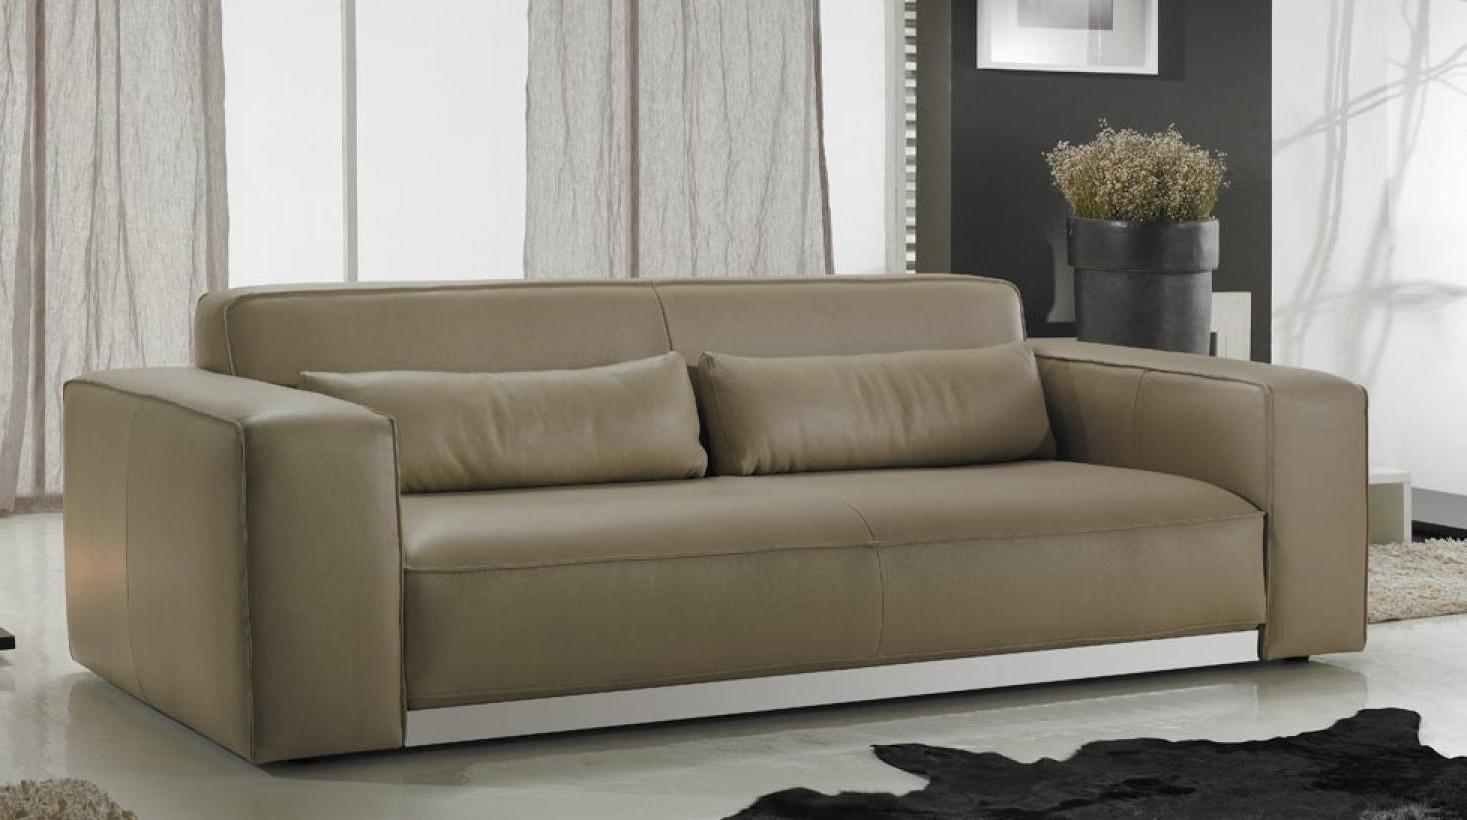 canape design luxe italien - Canape Design Luxe Italien